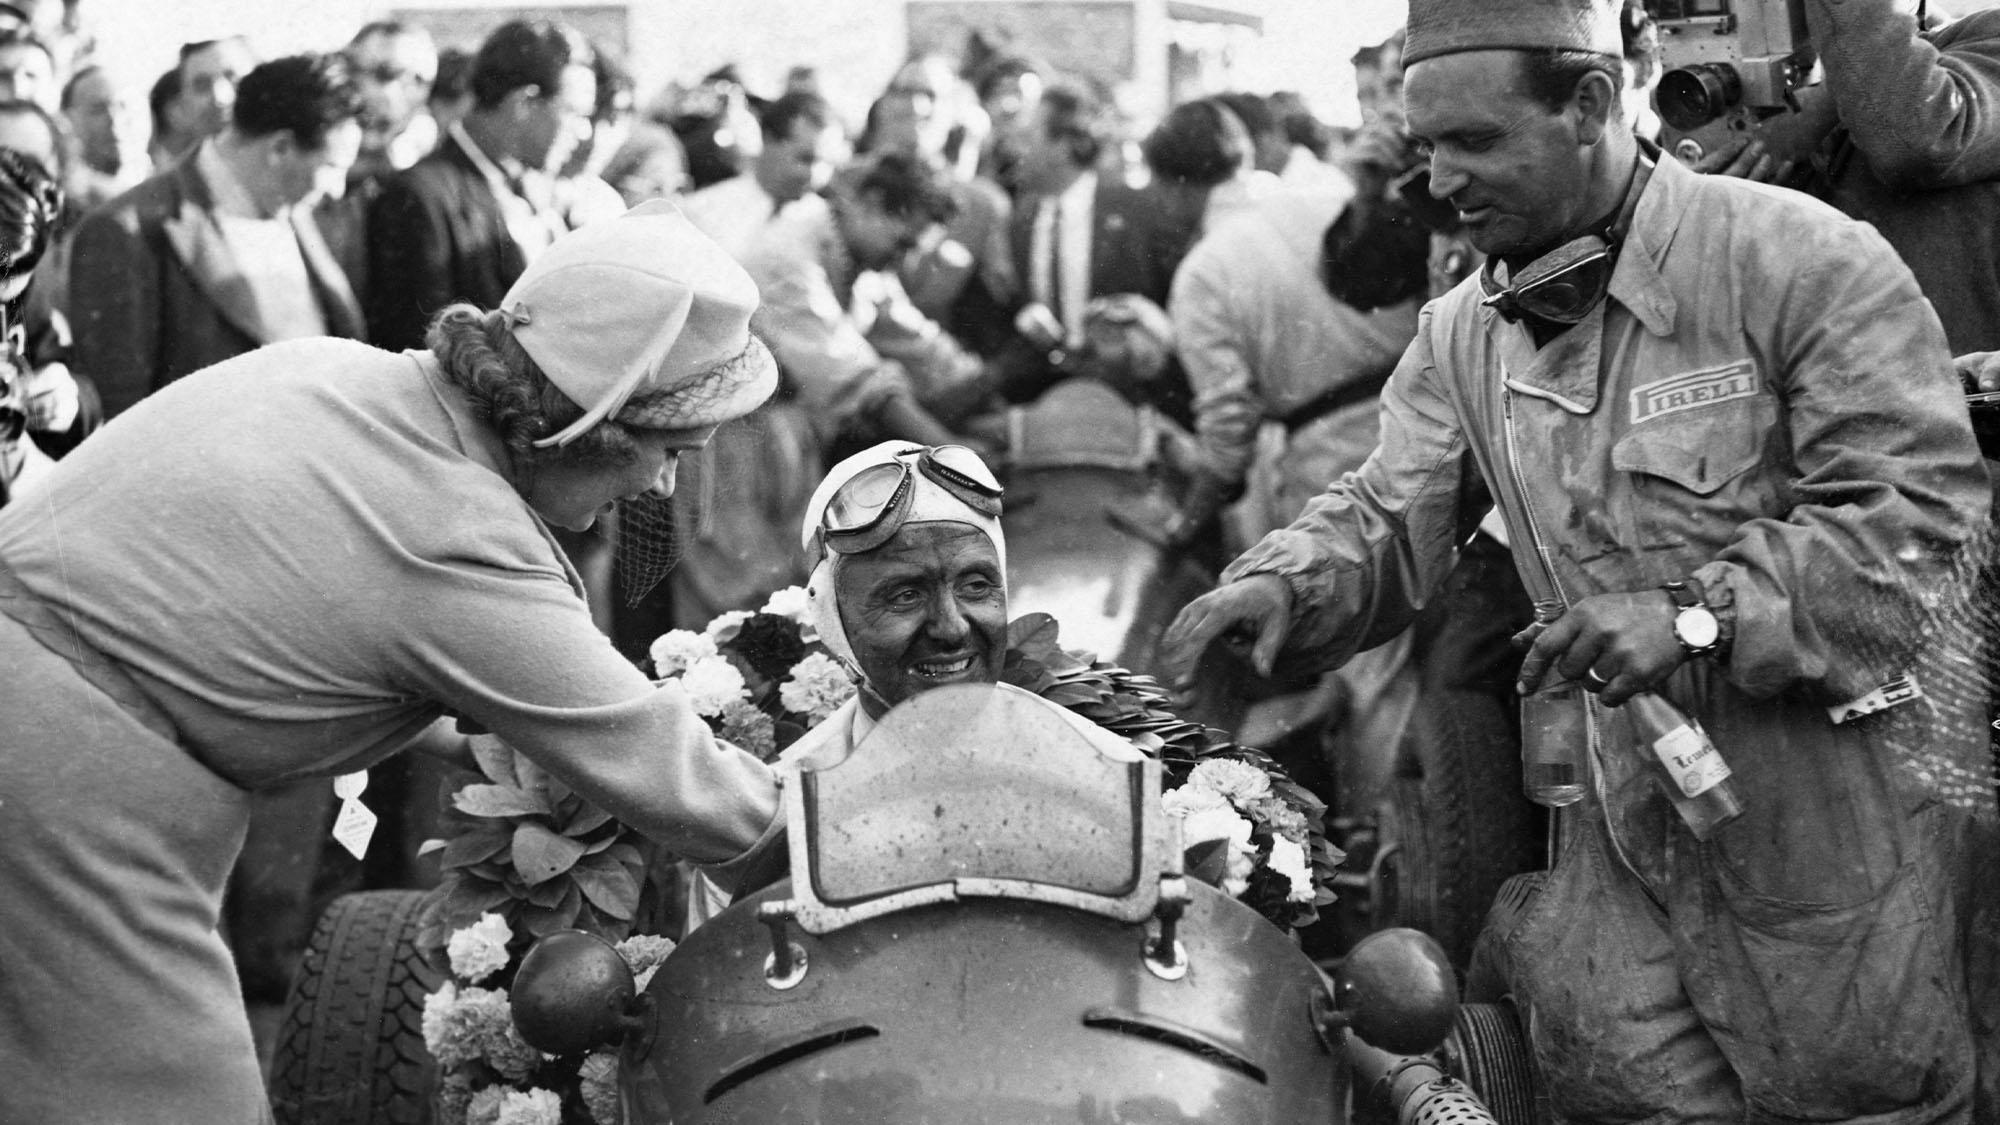 Lady Howe puts a wreath around Luigi Villoresi in his Maserati racecar after he won the International Grand Prix. (Photo by © Hulton-Deutsch Collection/CORBIS/Corbis via Getty Images)